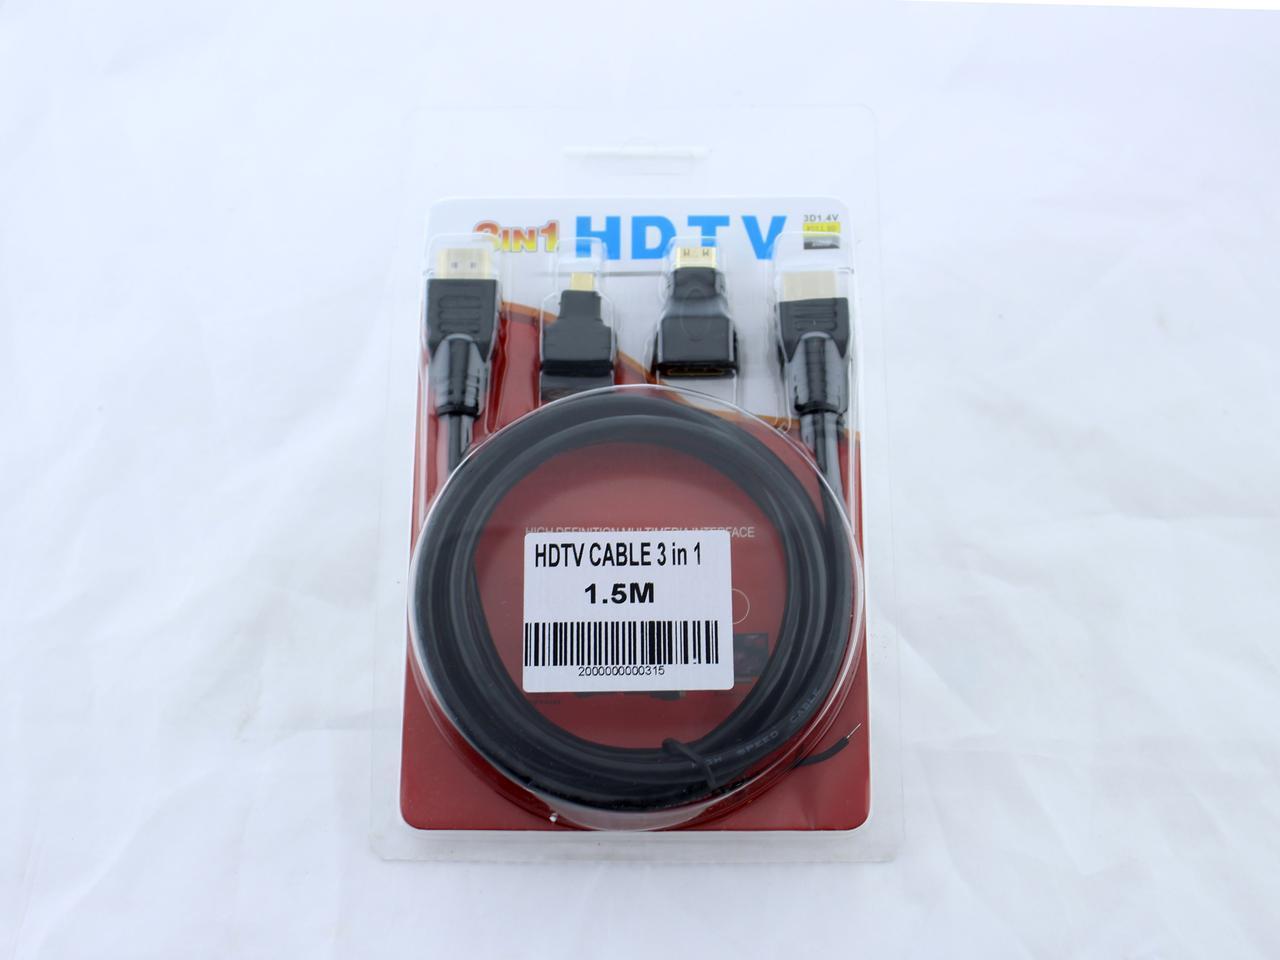 Кабель HDMI 3IN1 (125)  в уп. 125шт.